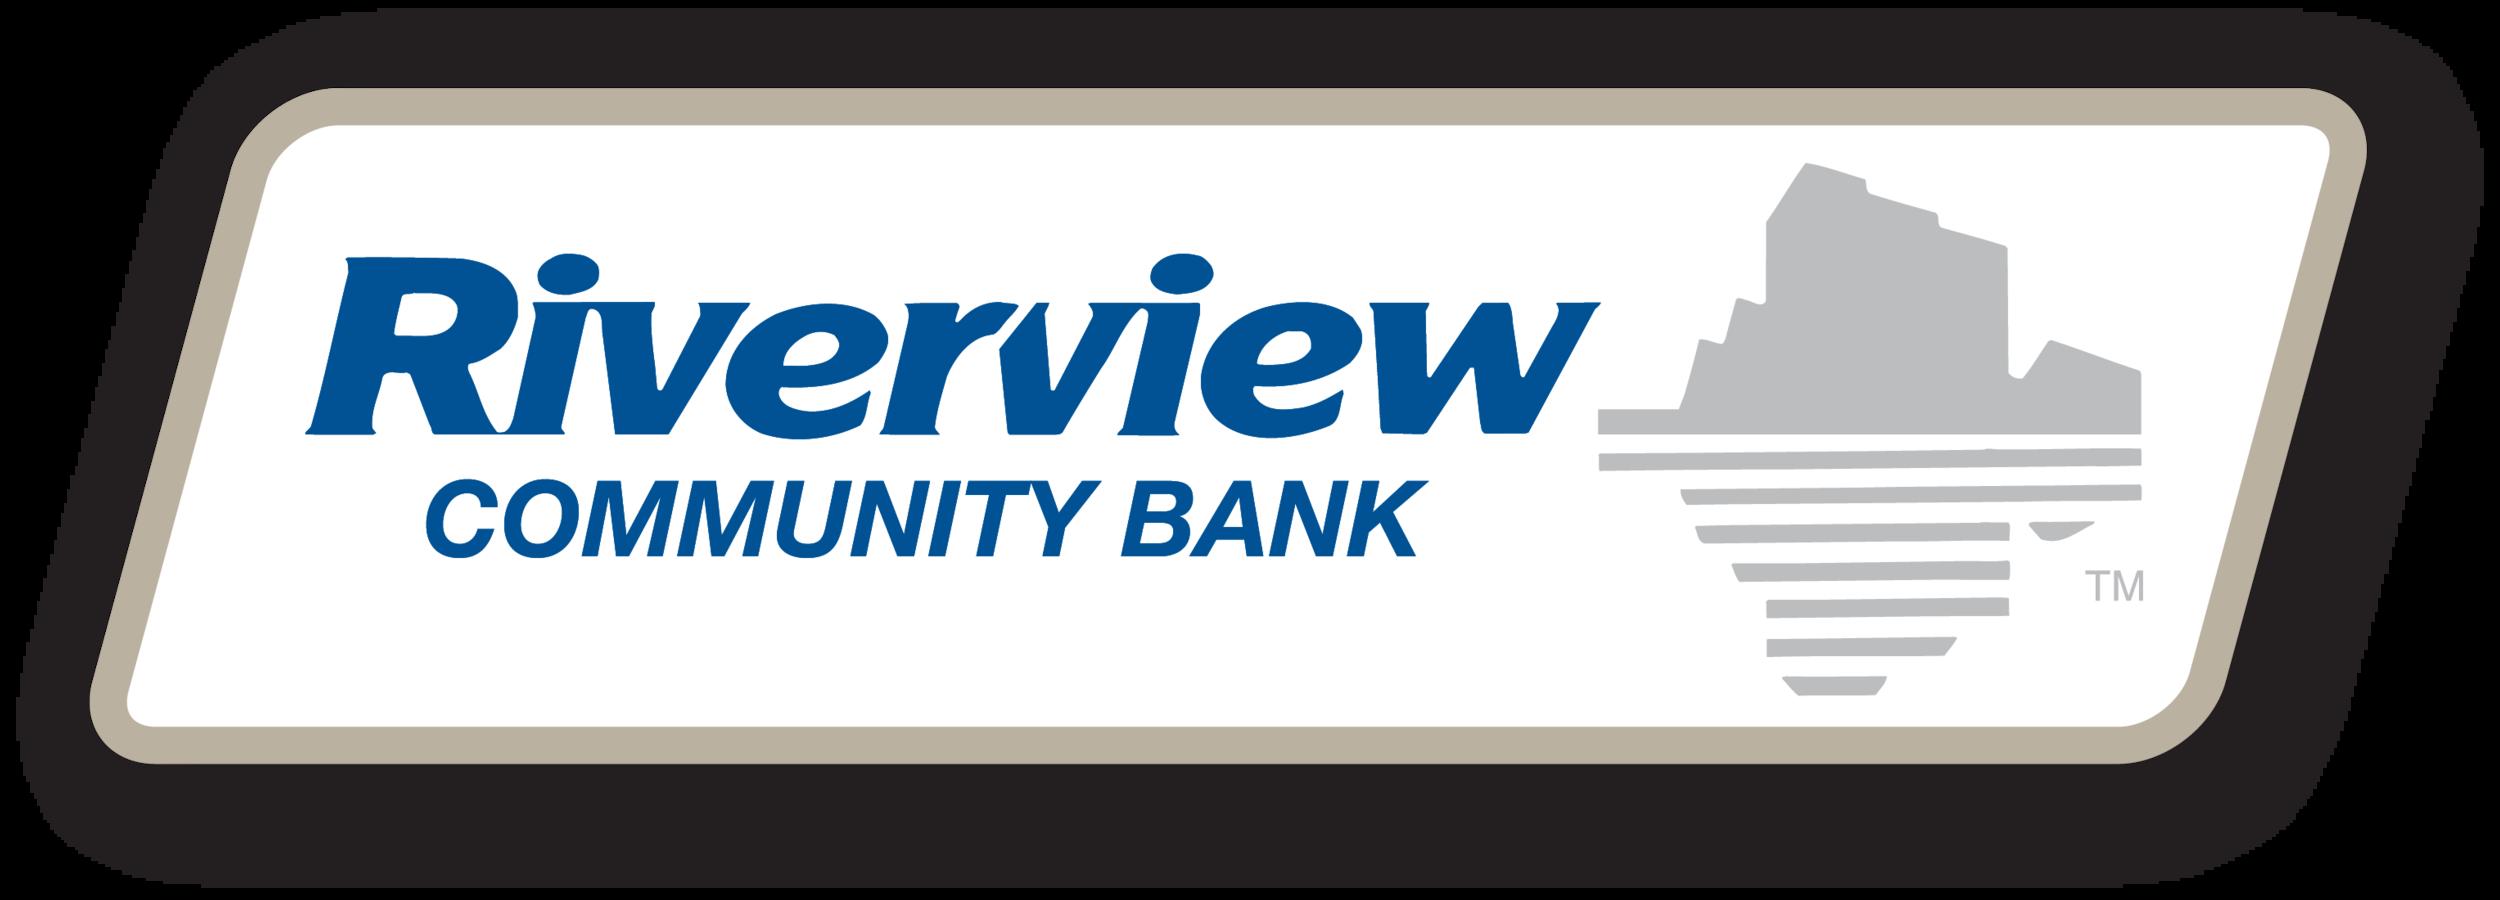 Riverview Community Bank.png